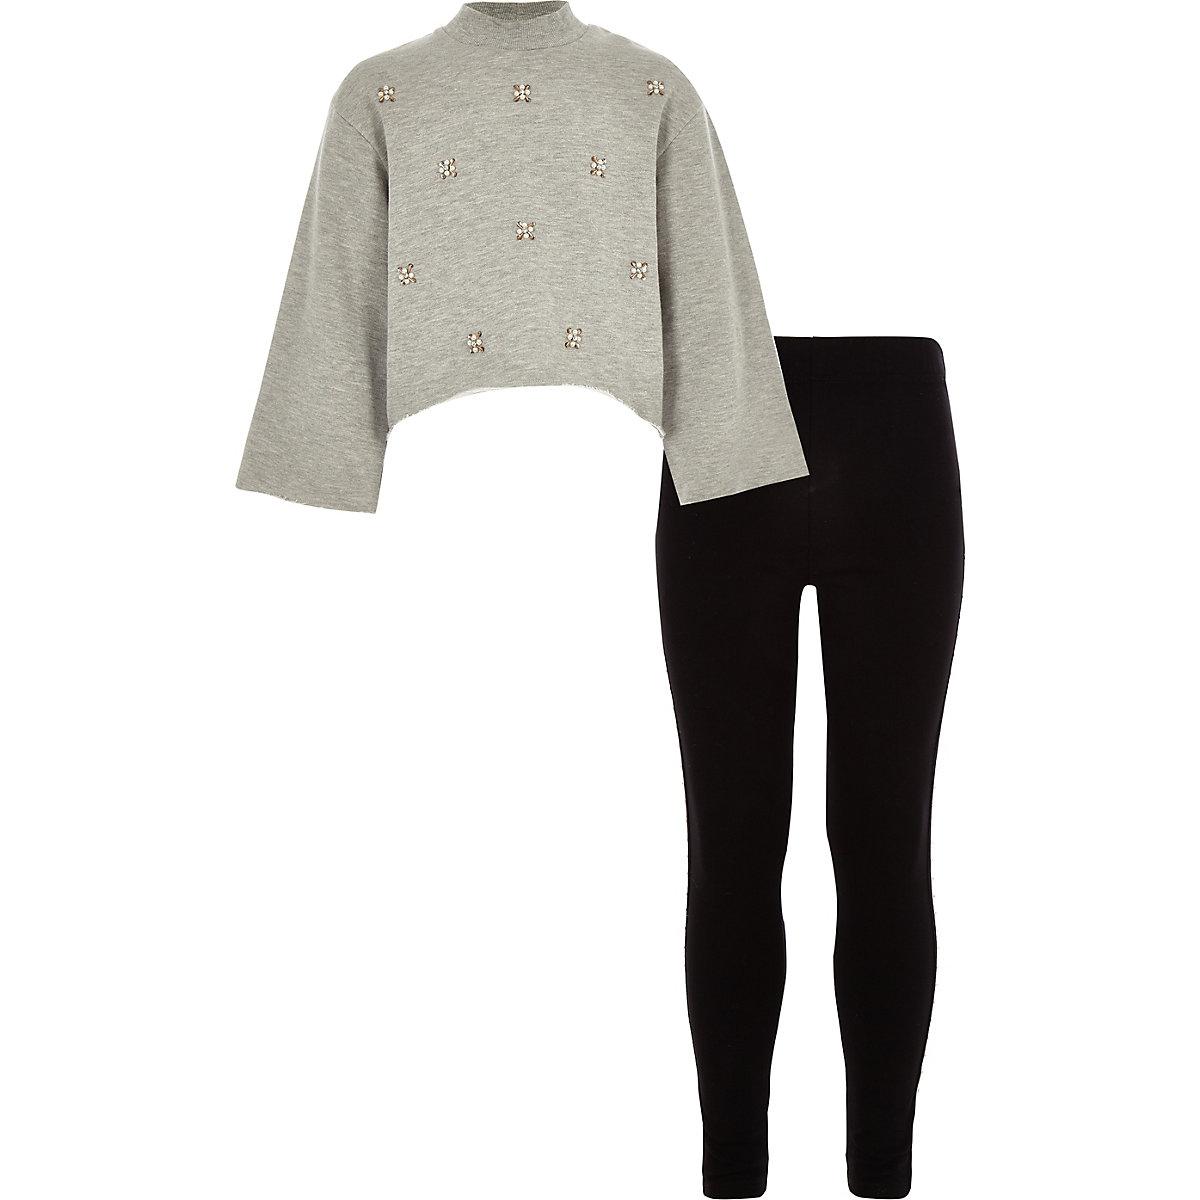 Girls grey embellished sweatshirt outfit